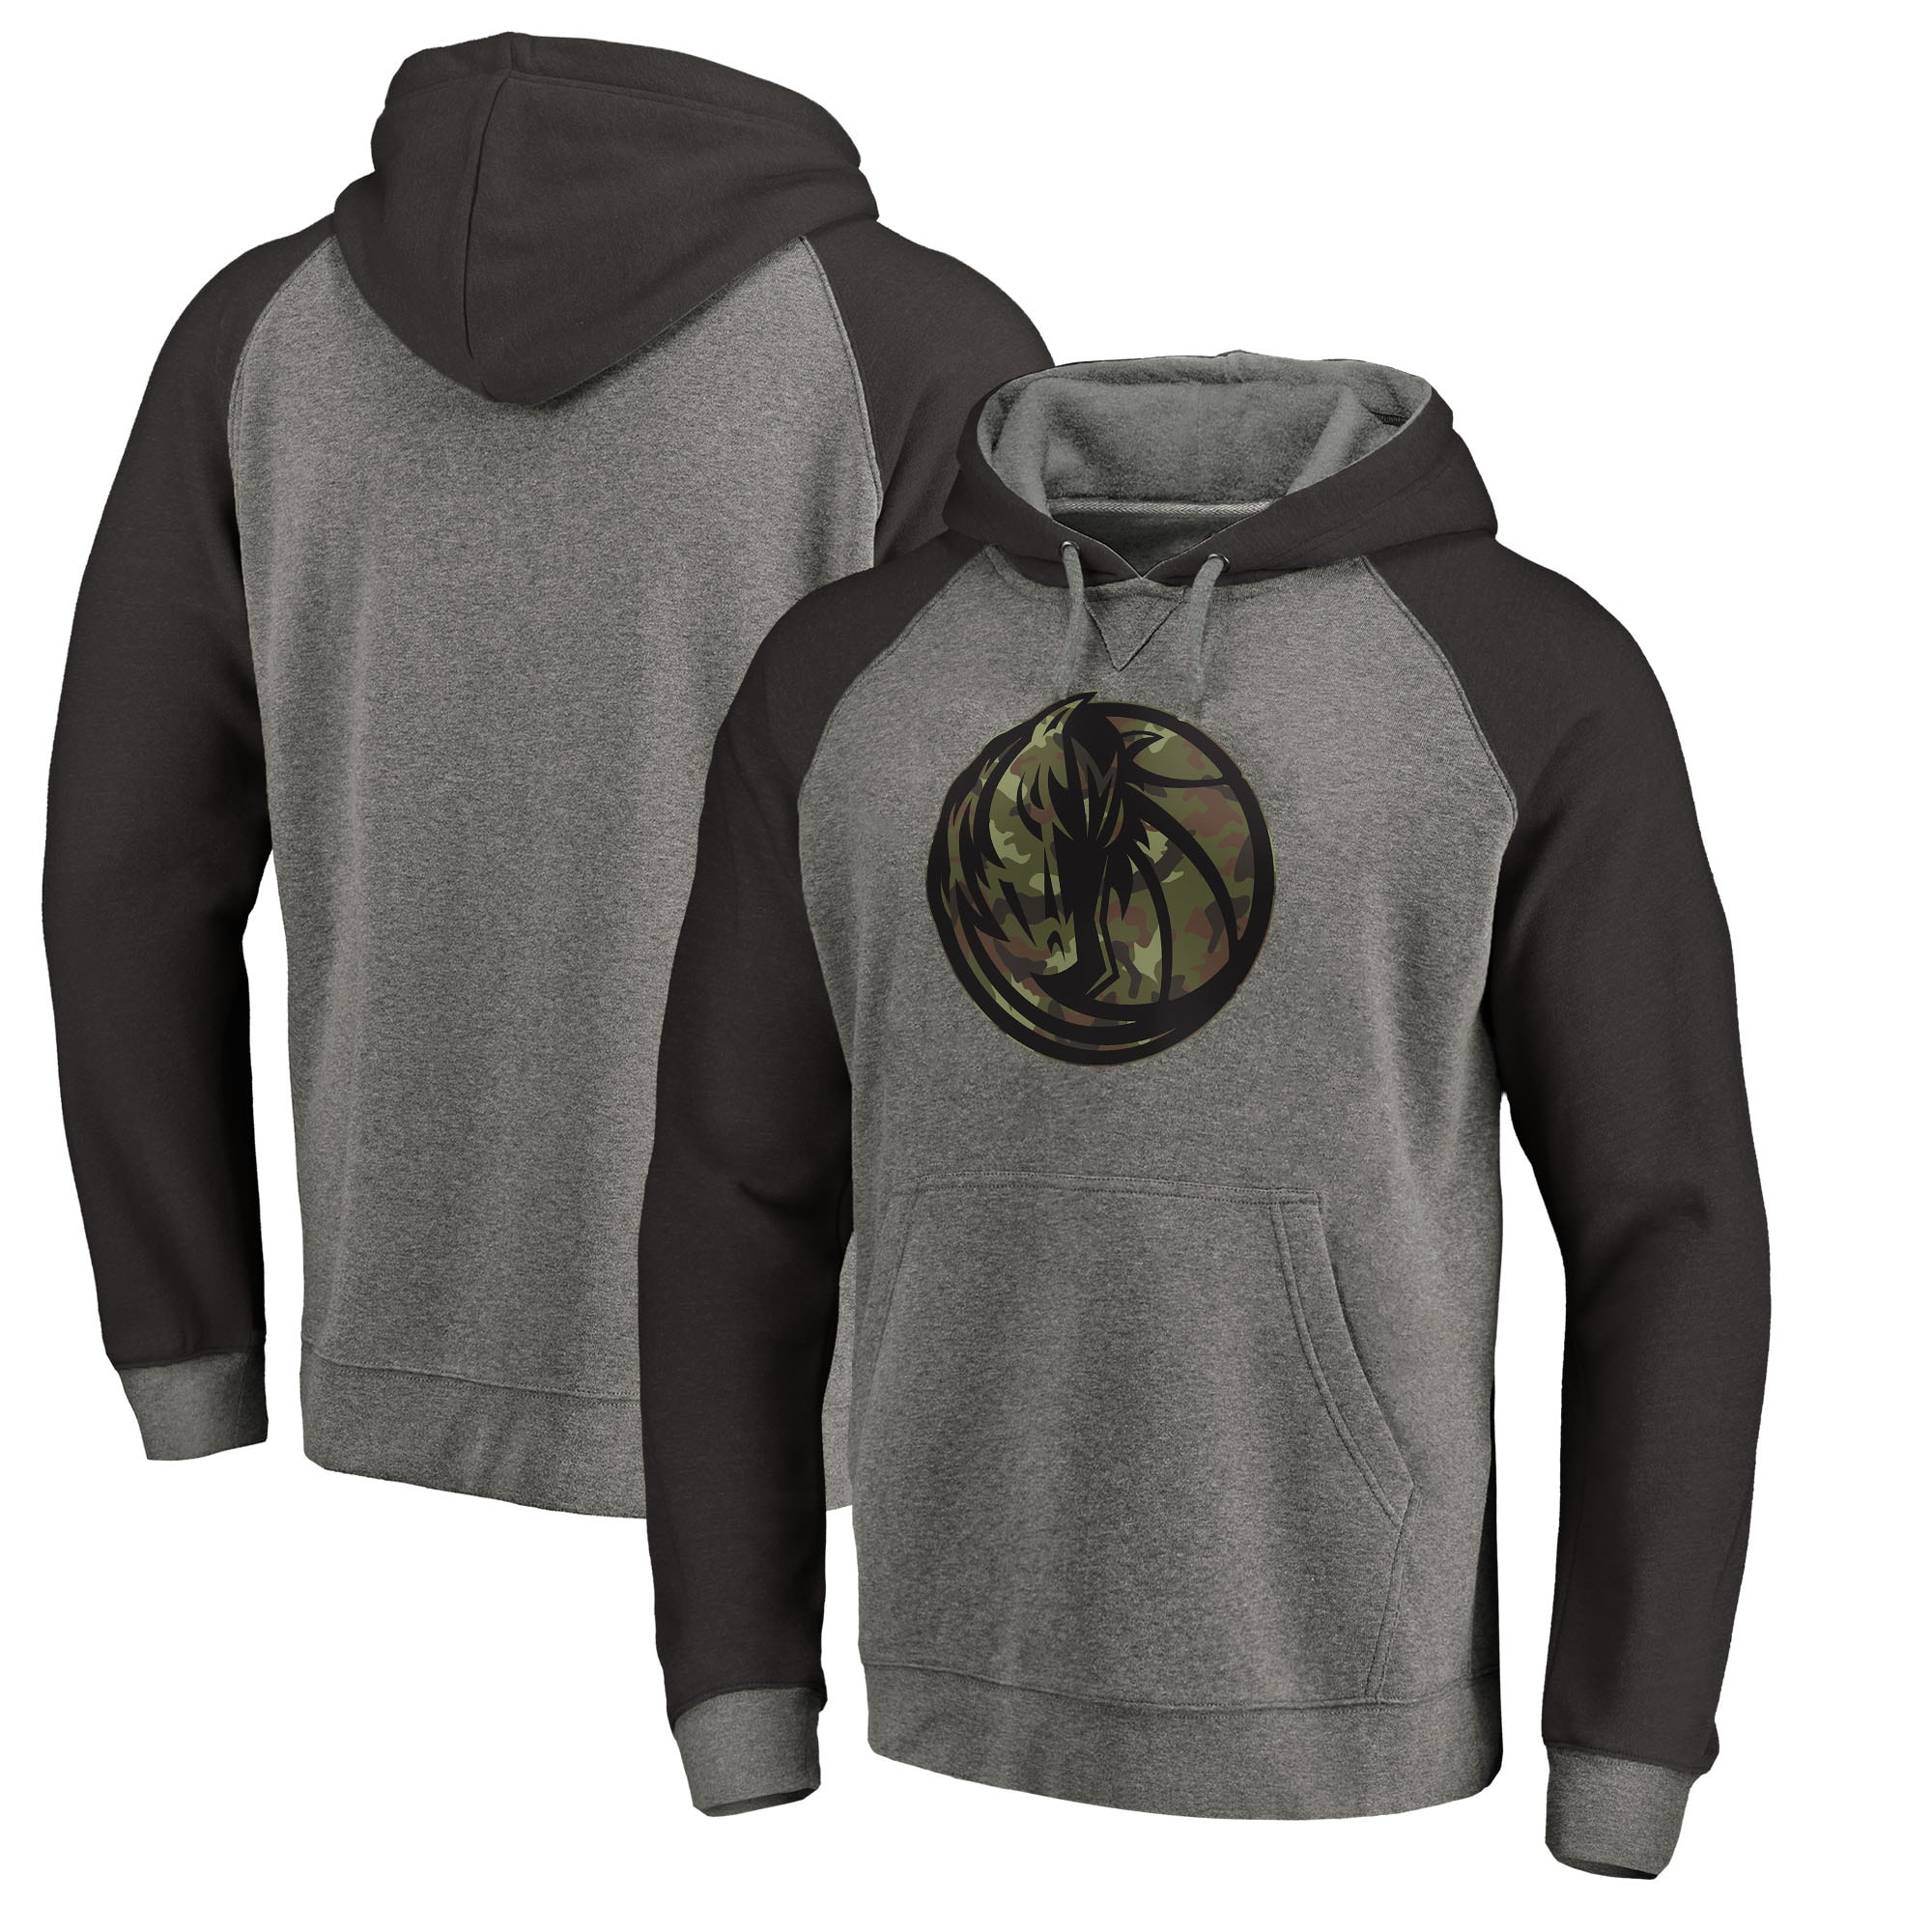 Dallas Mavericks Fanatics Branded Prestige Camo Tri-Blend Pullover Hoodie - Heathered Gray